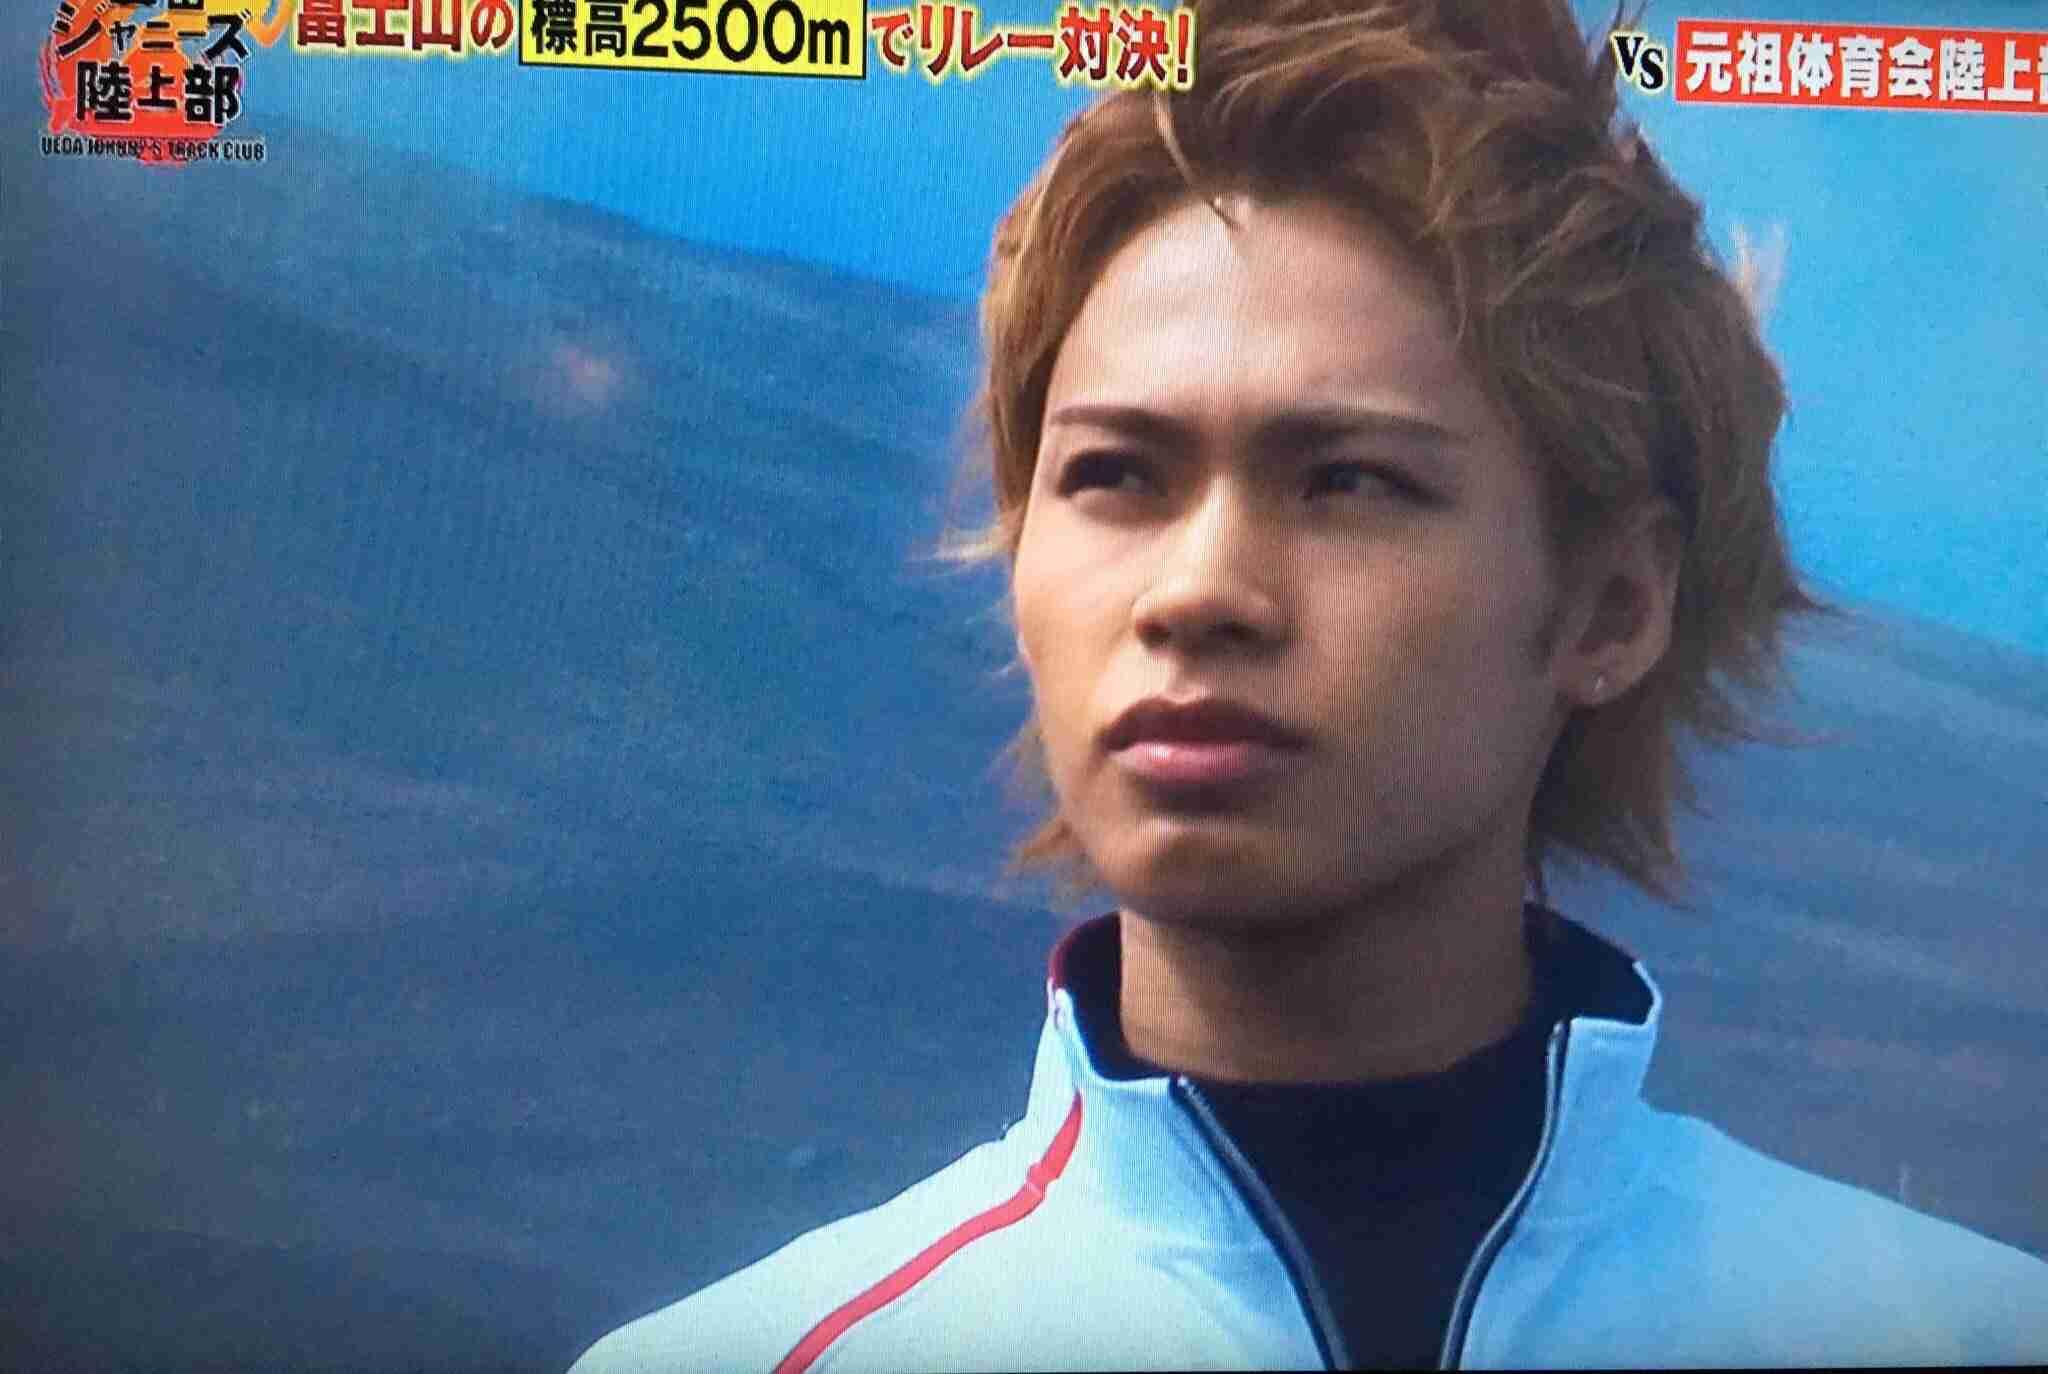 KAT-TUNの中丸雄一 「逃げ恥」の幻の主演候補だった?